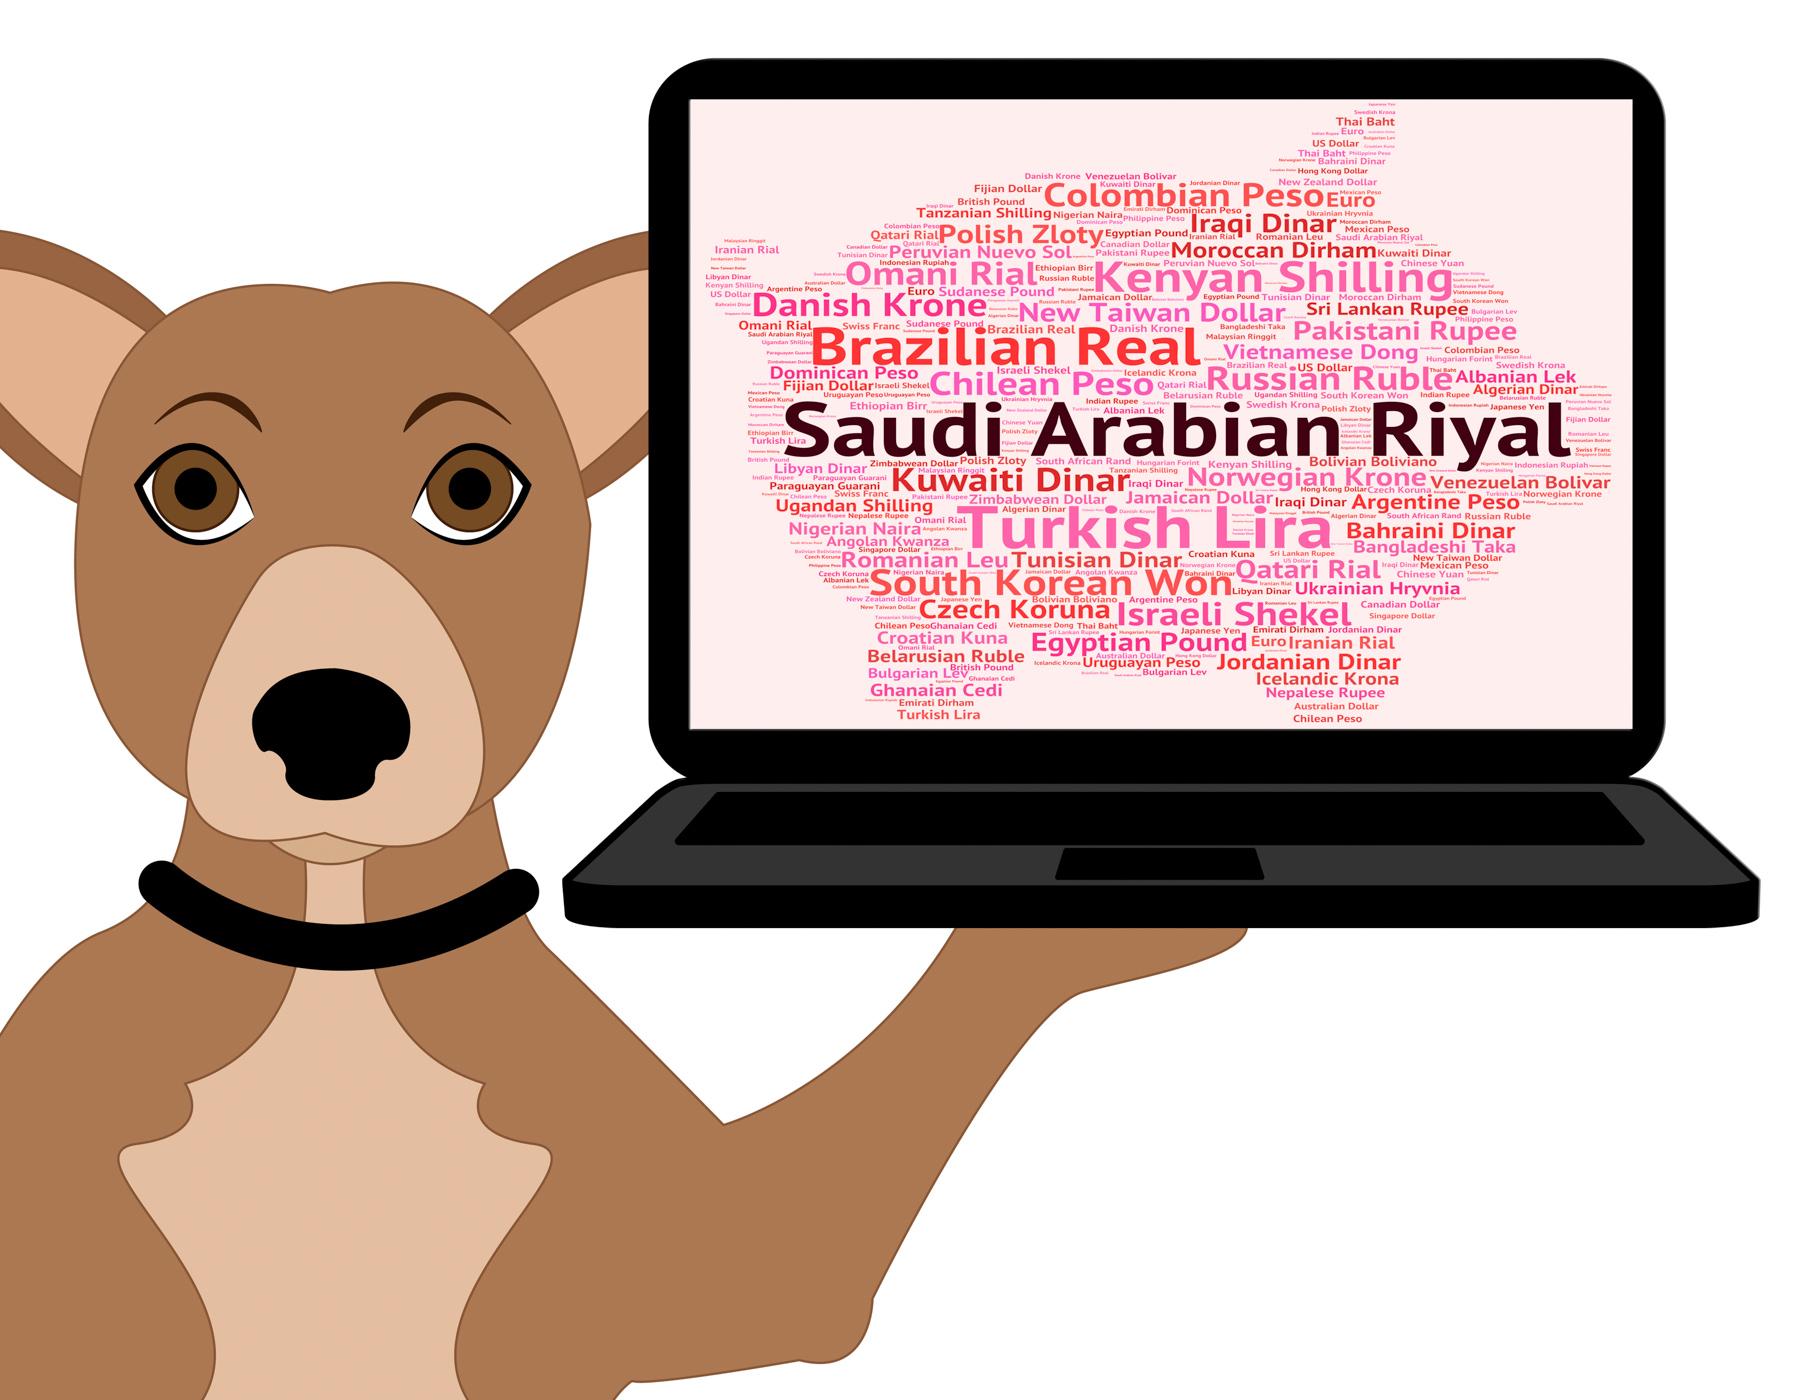 Saudi arabian riyal shows foreign currency and coin photo